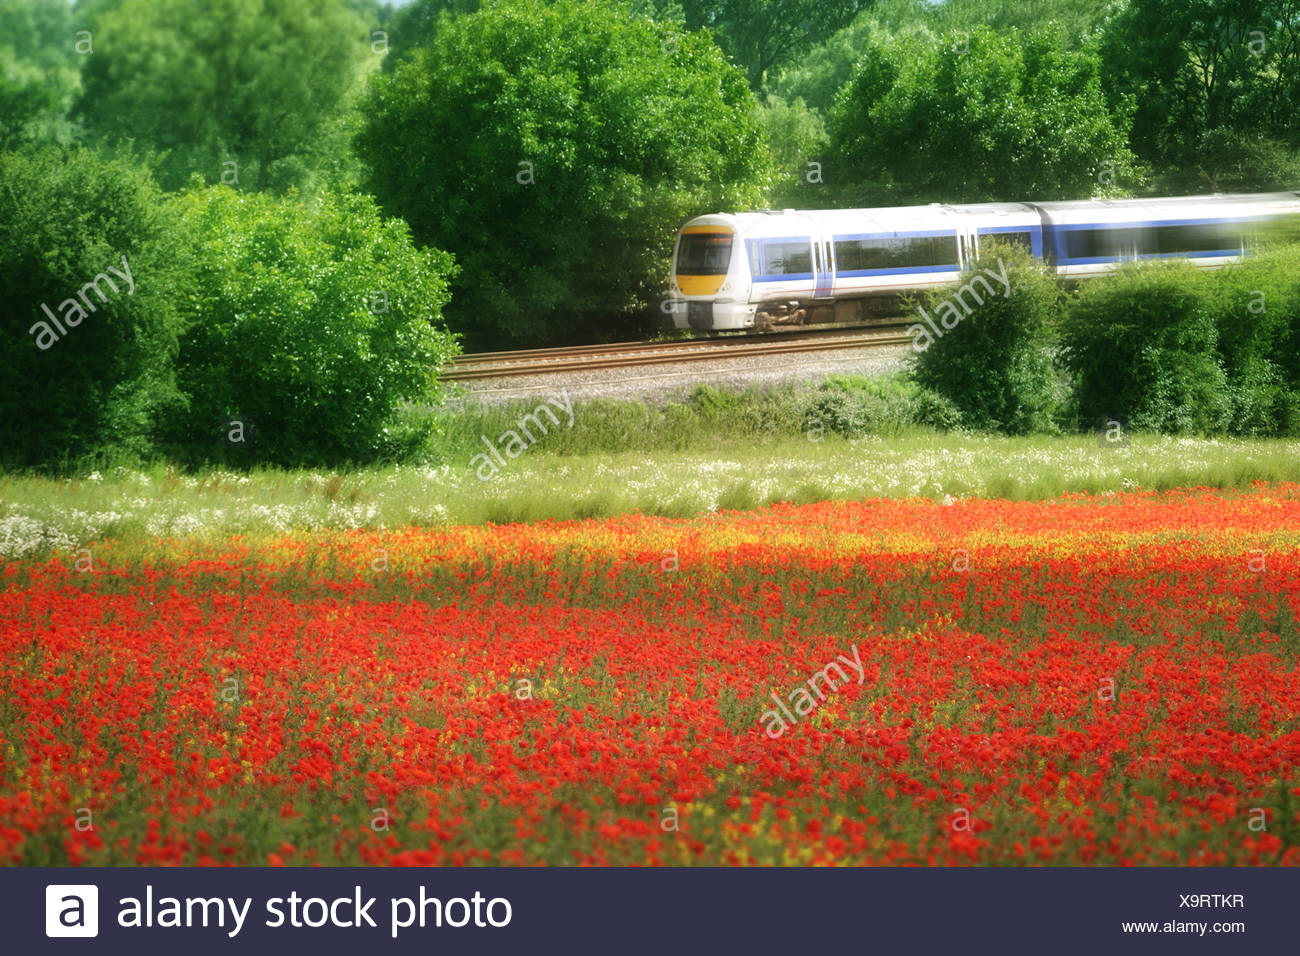 train 2 - Stock Image